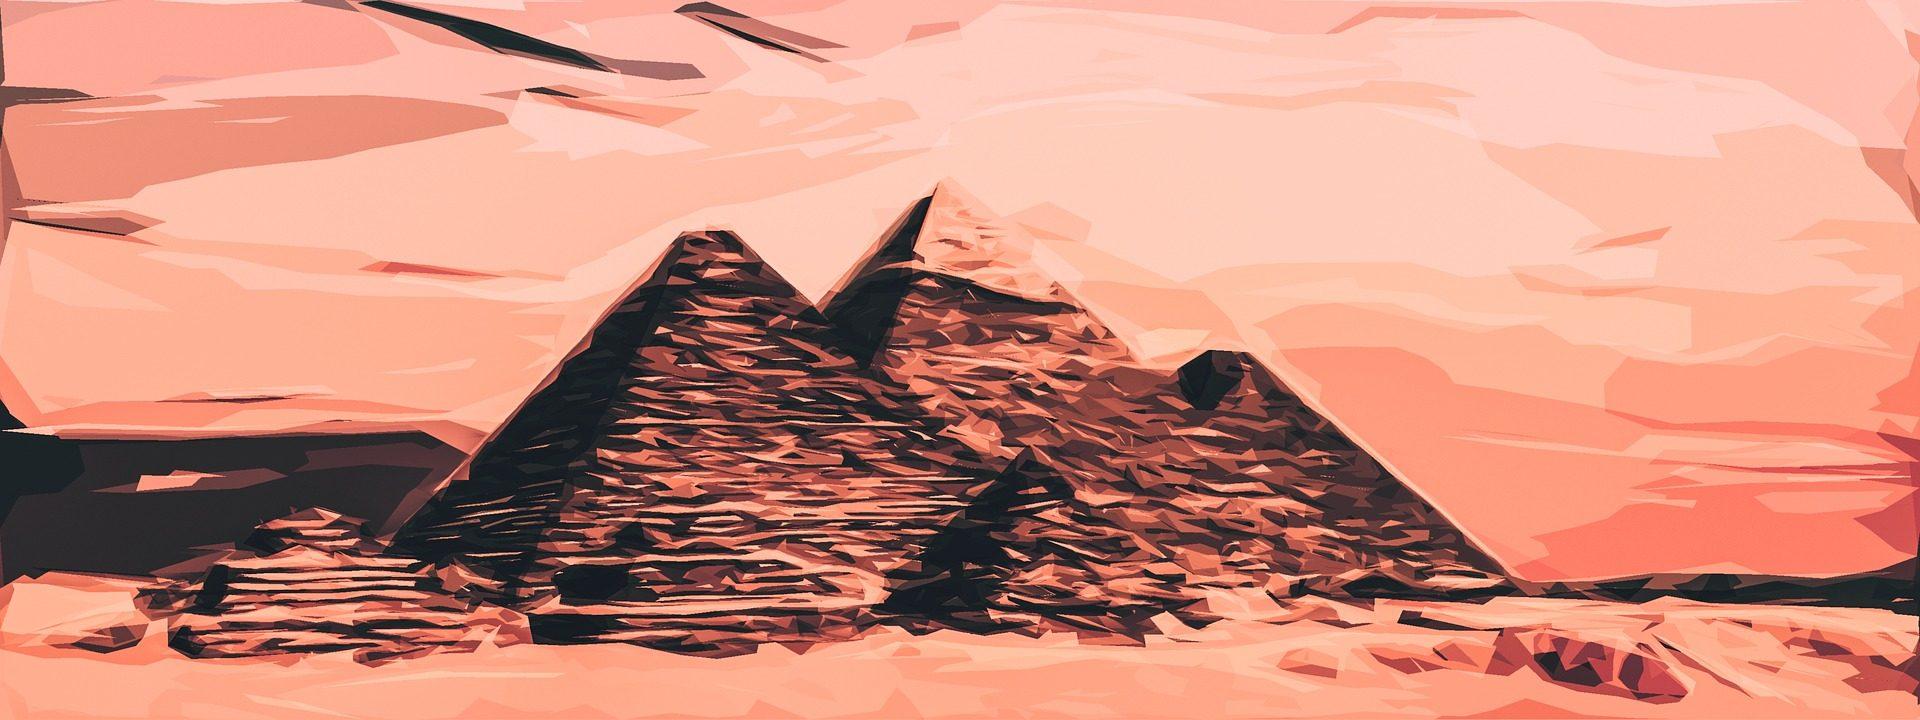 Pirámides, Egitto, Foto, tela di canapa, Strokes, pittura - Sfondi HD - Professor-falken.com